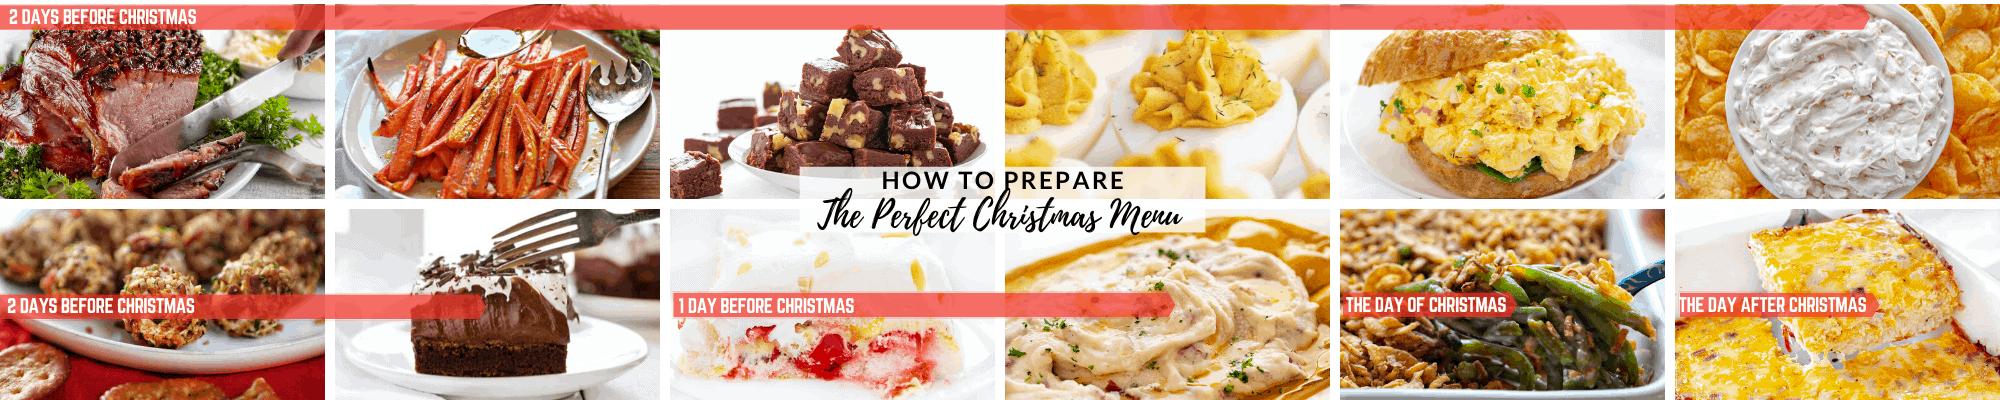 How to Prepare the Perfect Christmas Menu